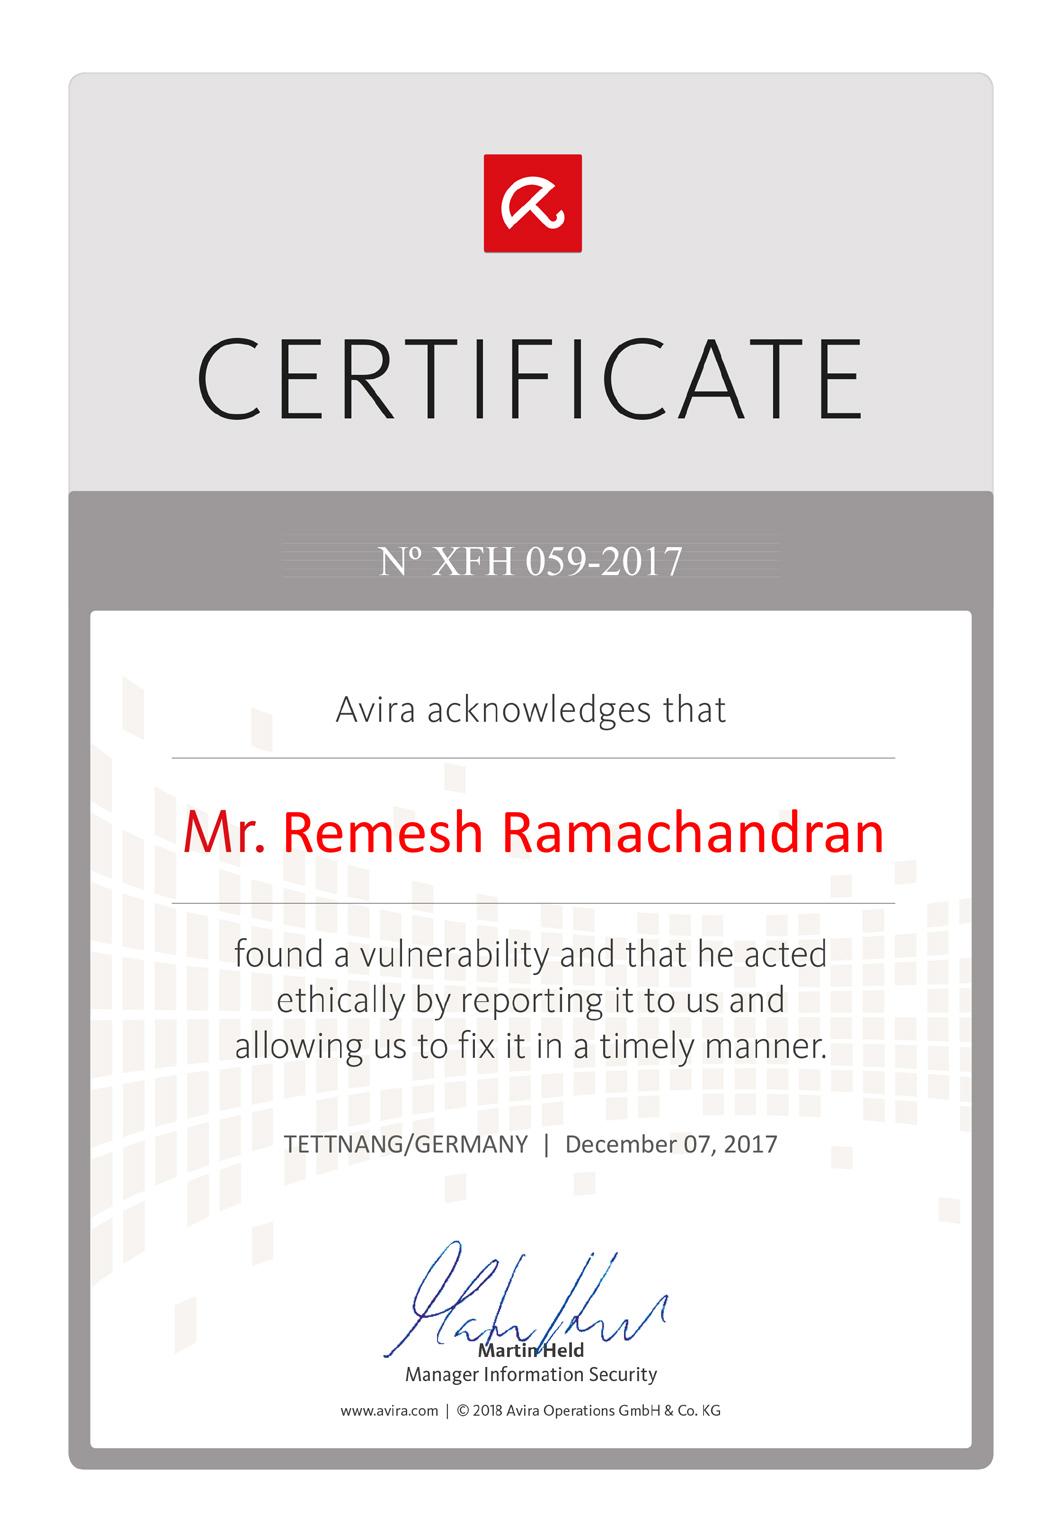 Avira Acknowledges Certificate